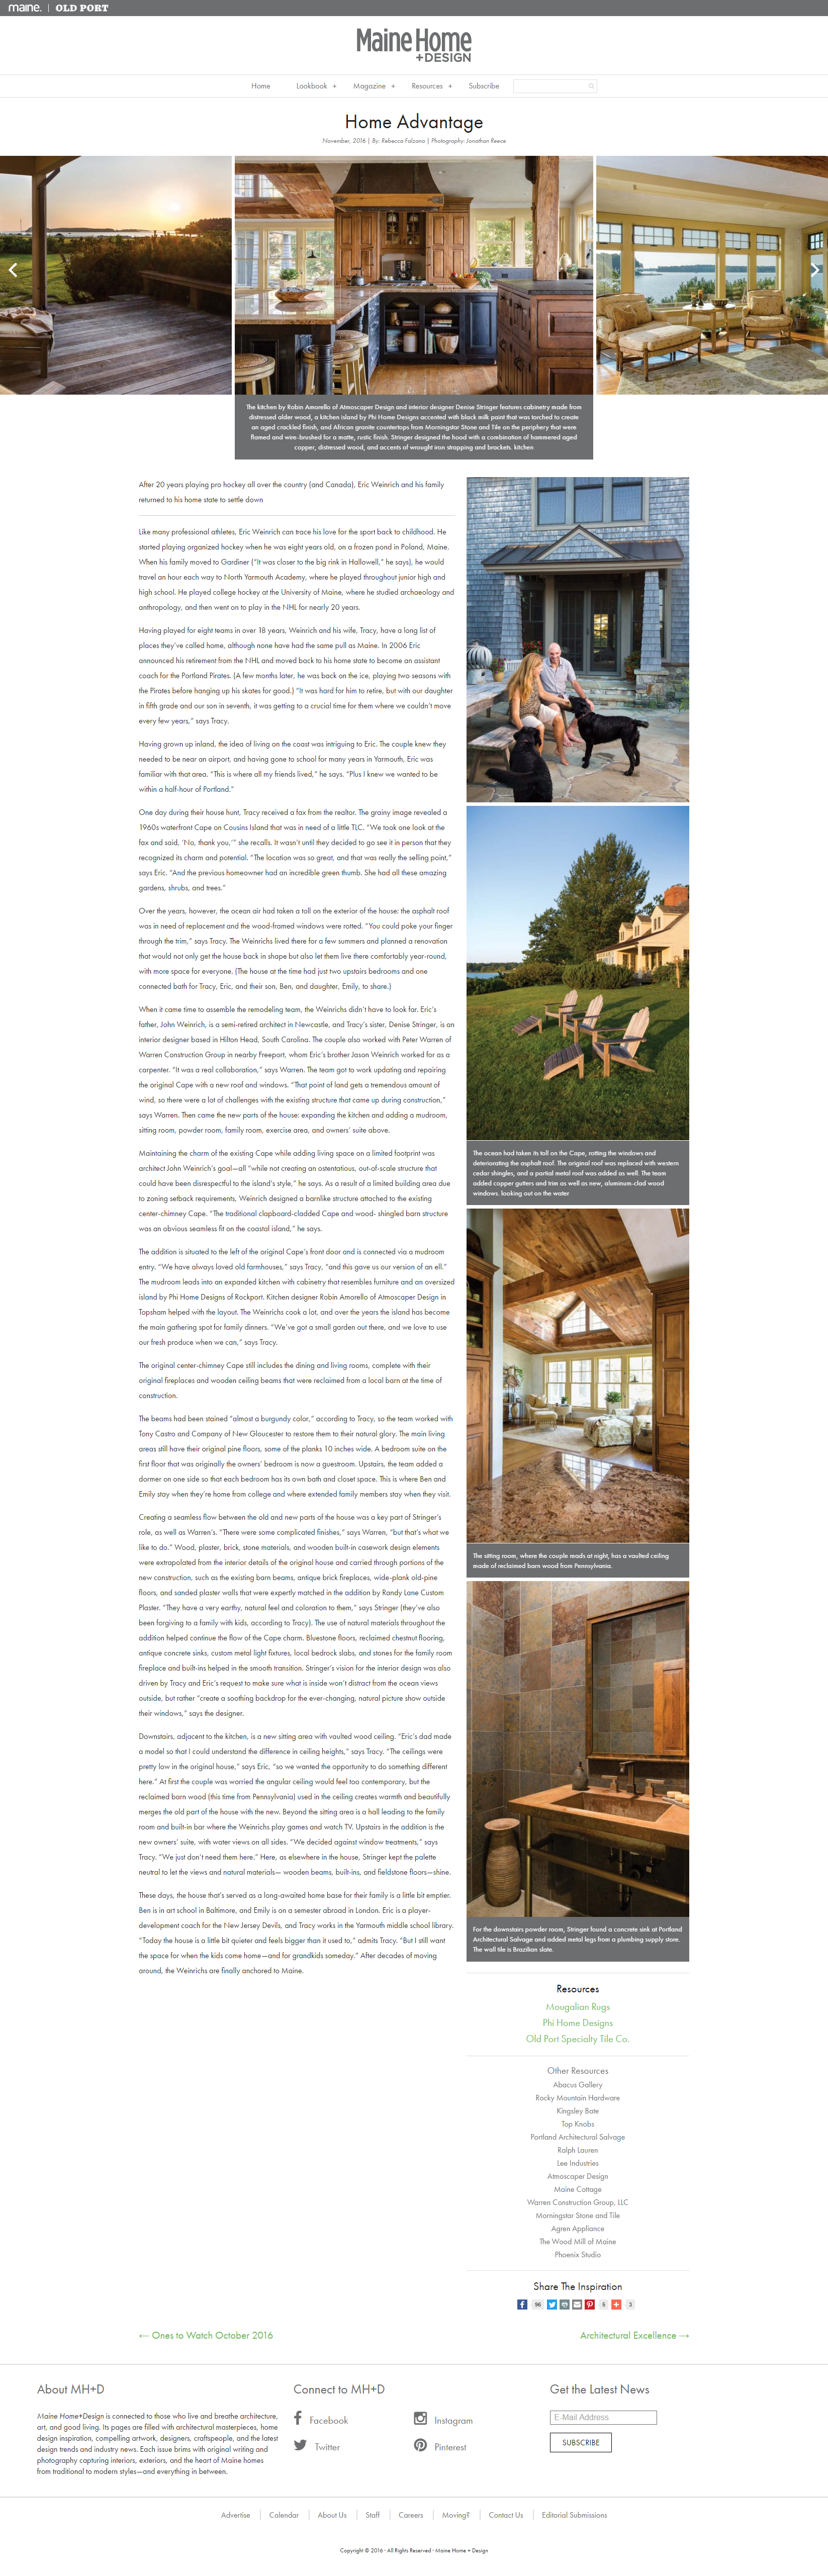 Home Advantage, Home Design